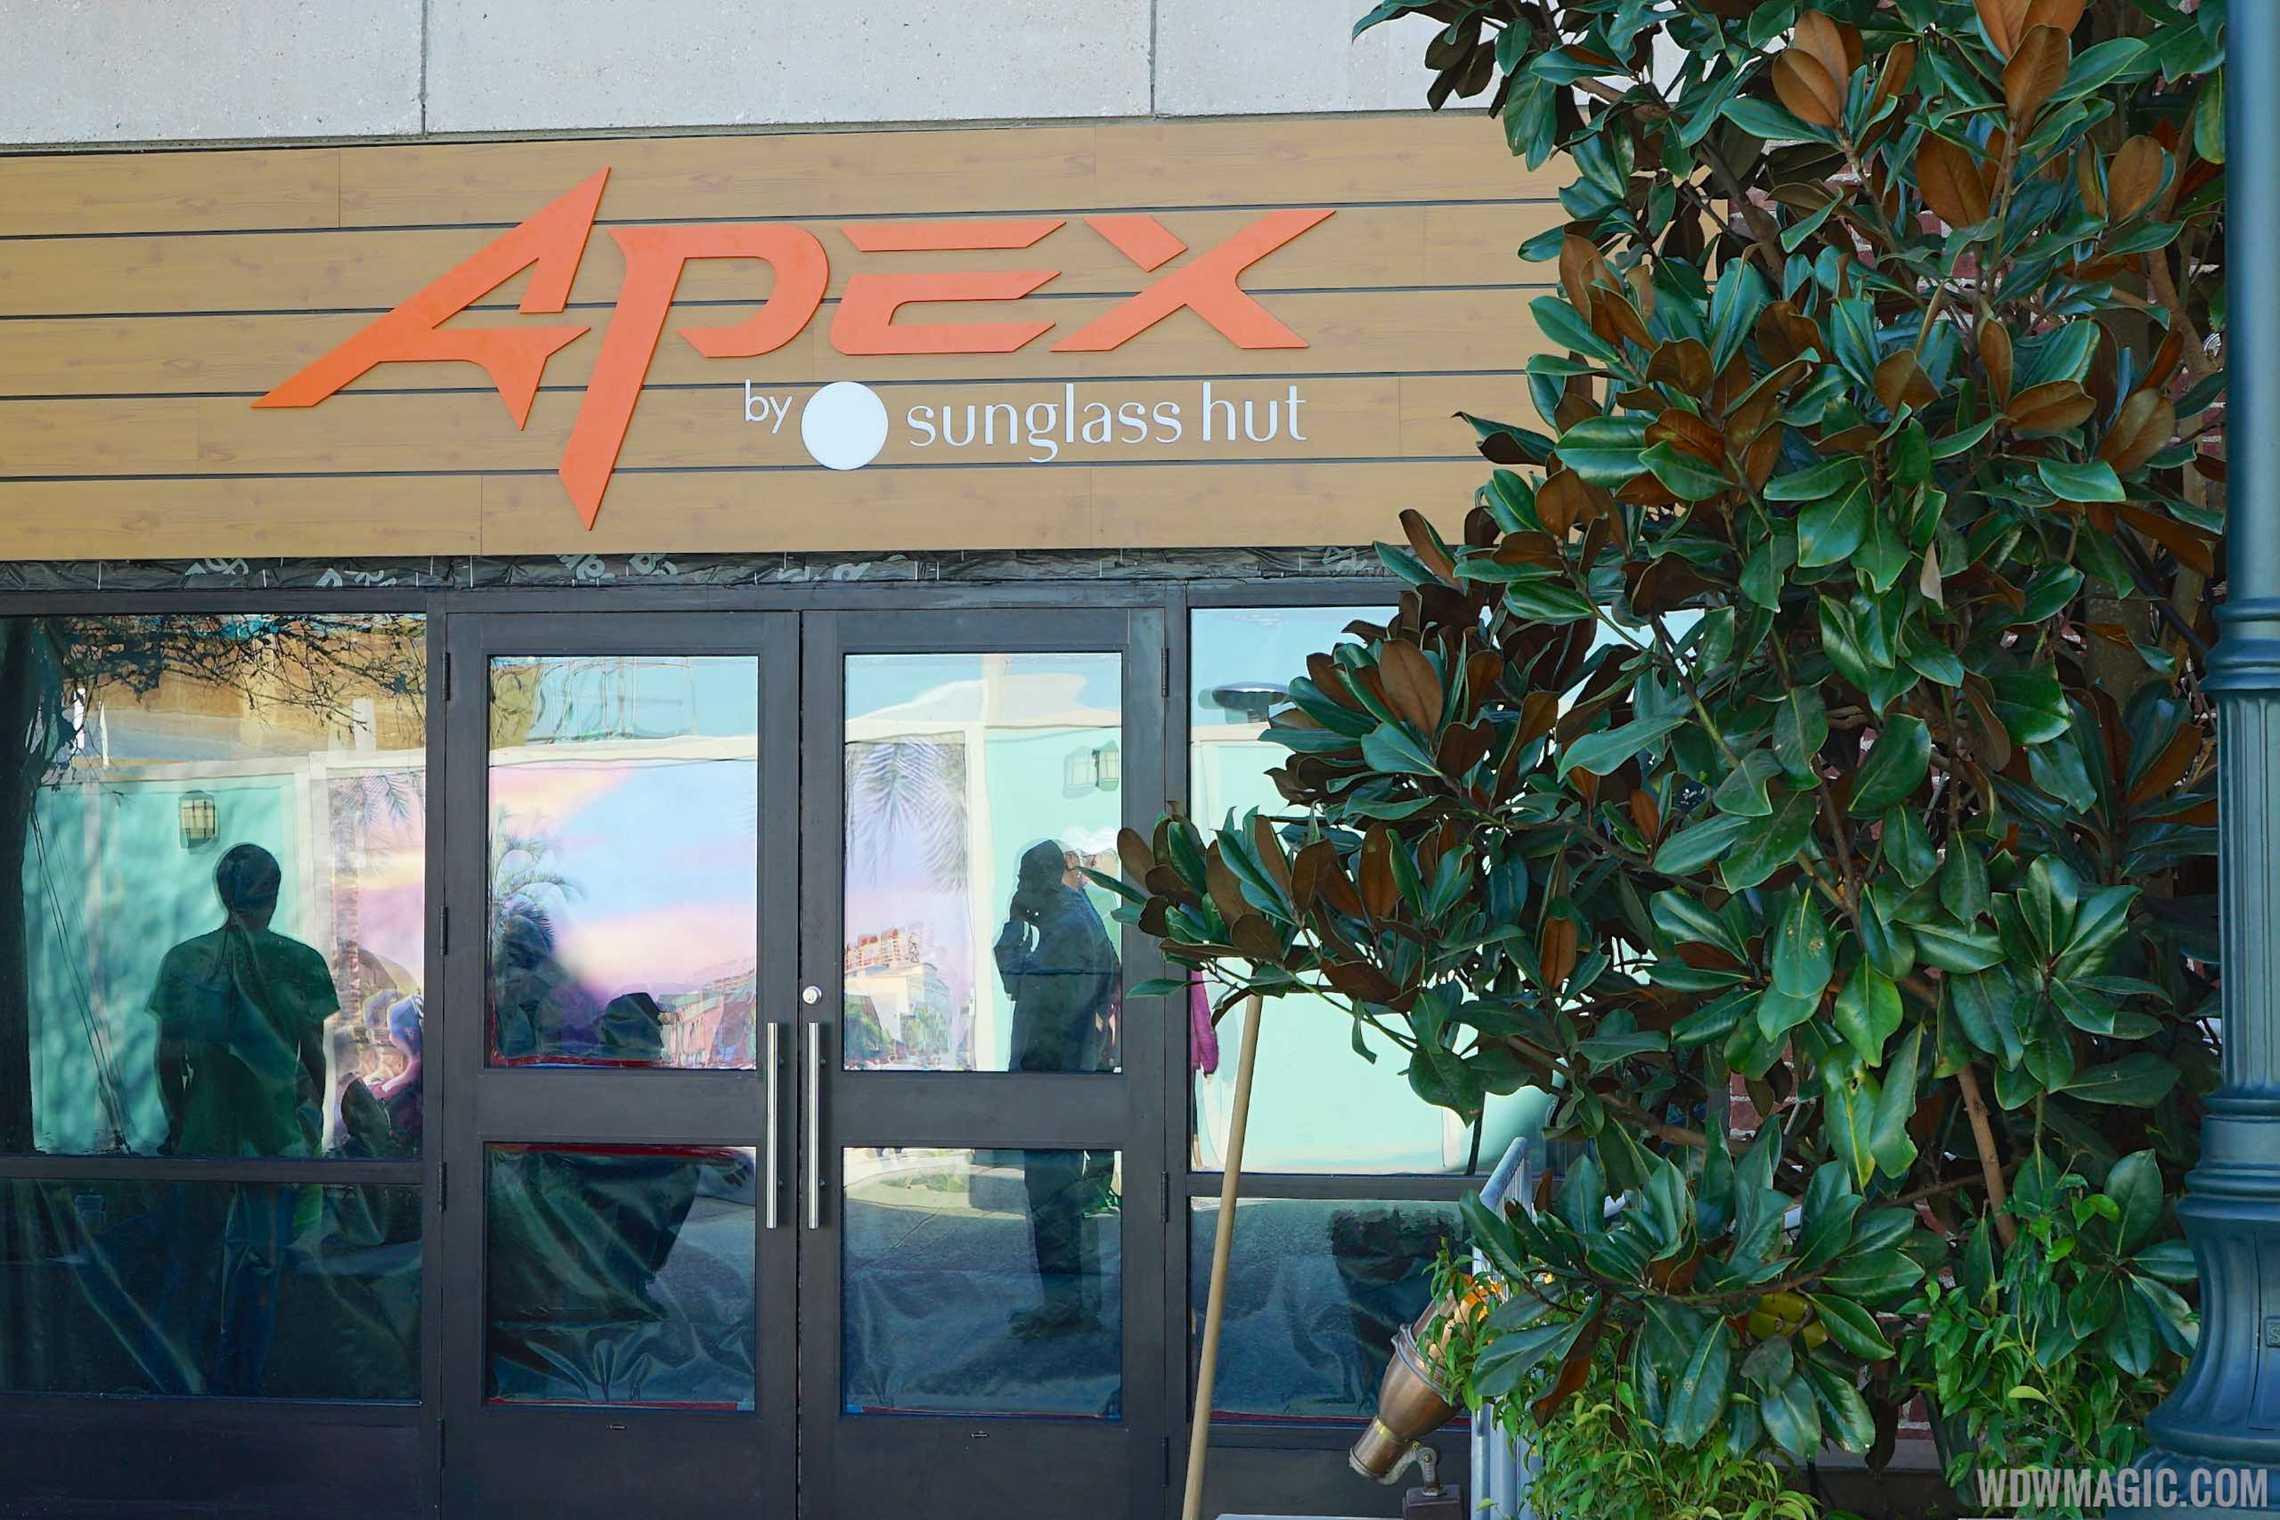 Apex by Sunglass Hut Signage